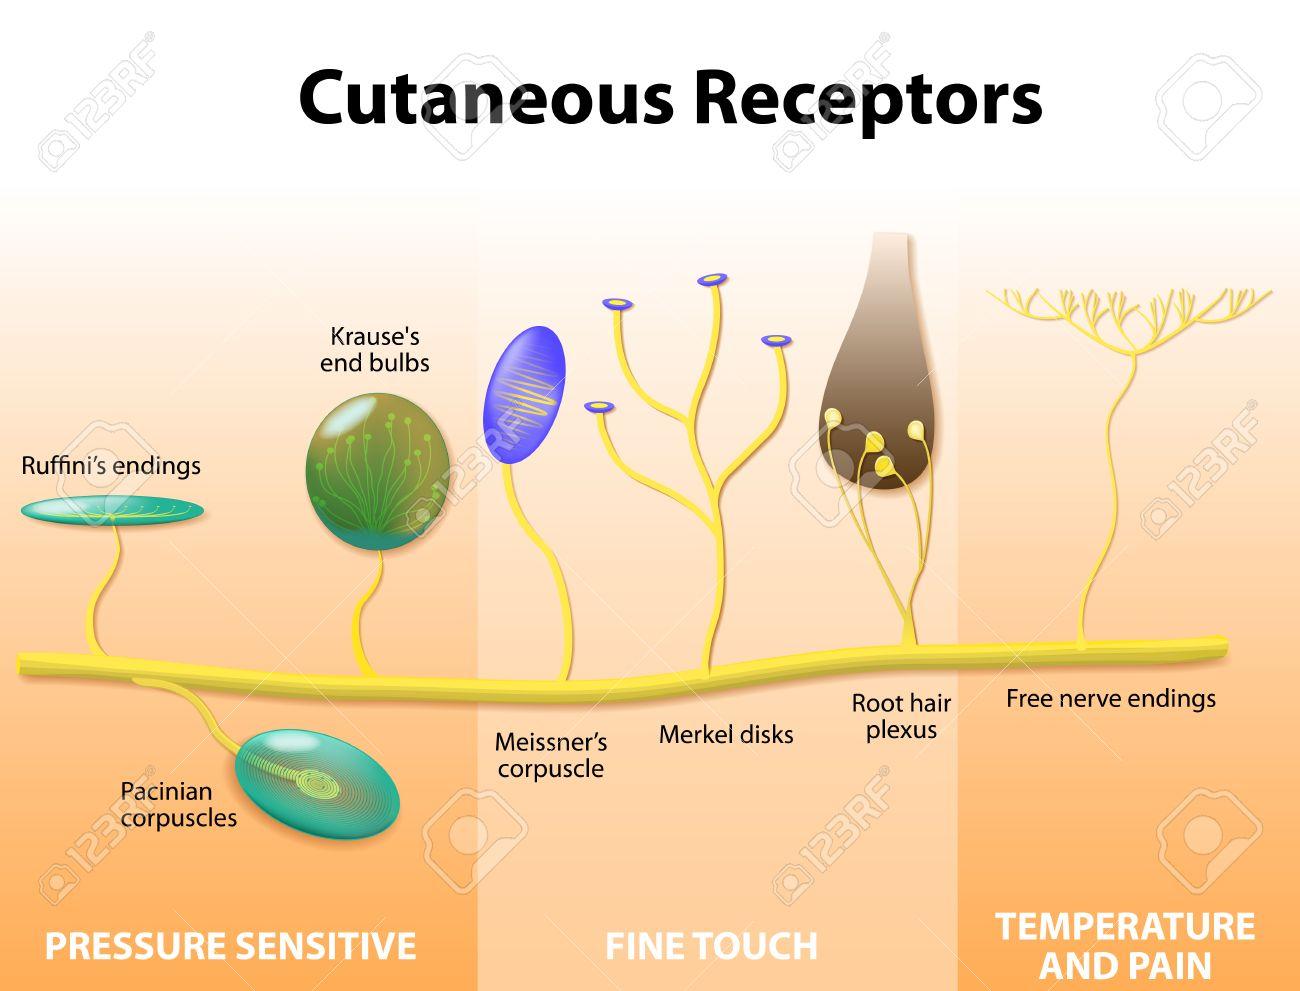 Cutaneous Receptors. Sensory Receptors In The Human Skin. Labeled ...